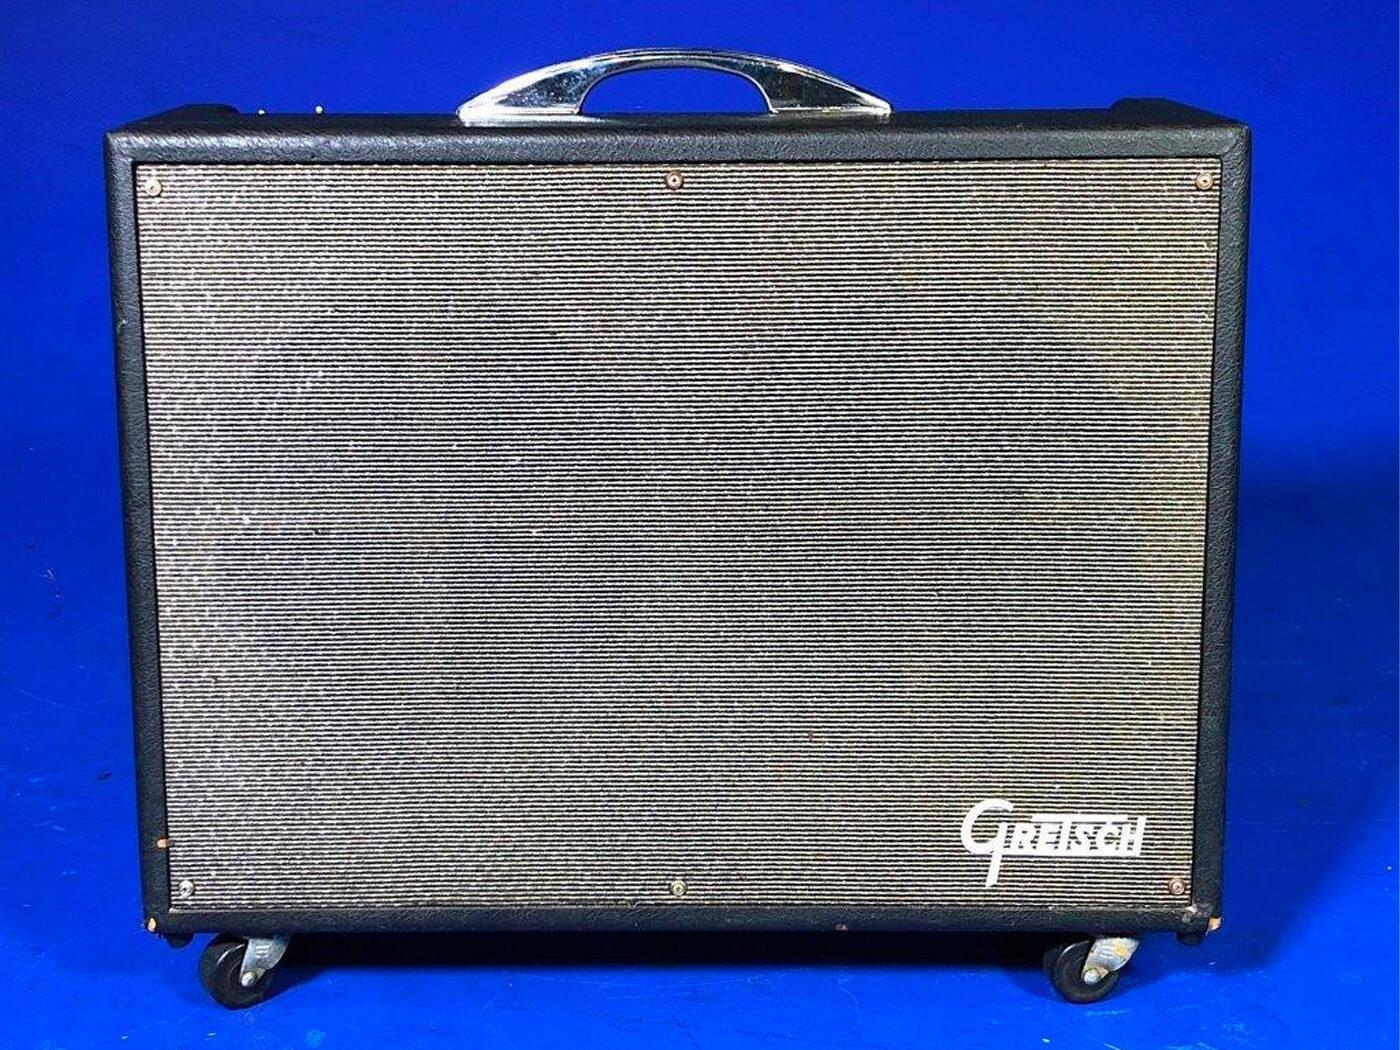 gretsch amp